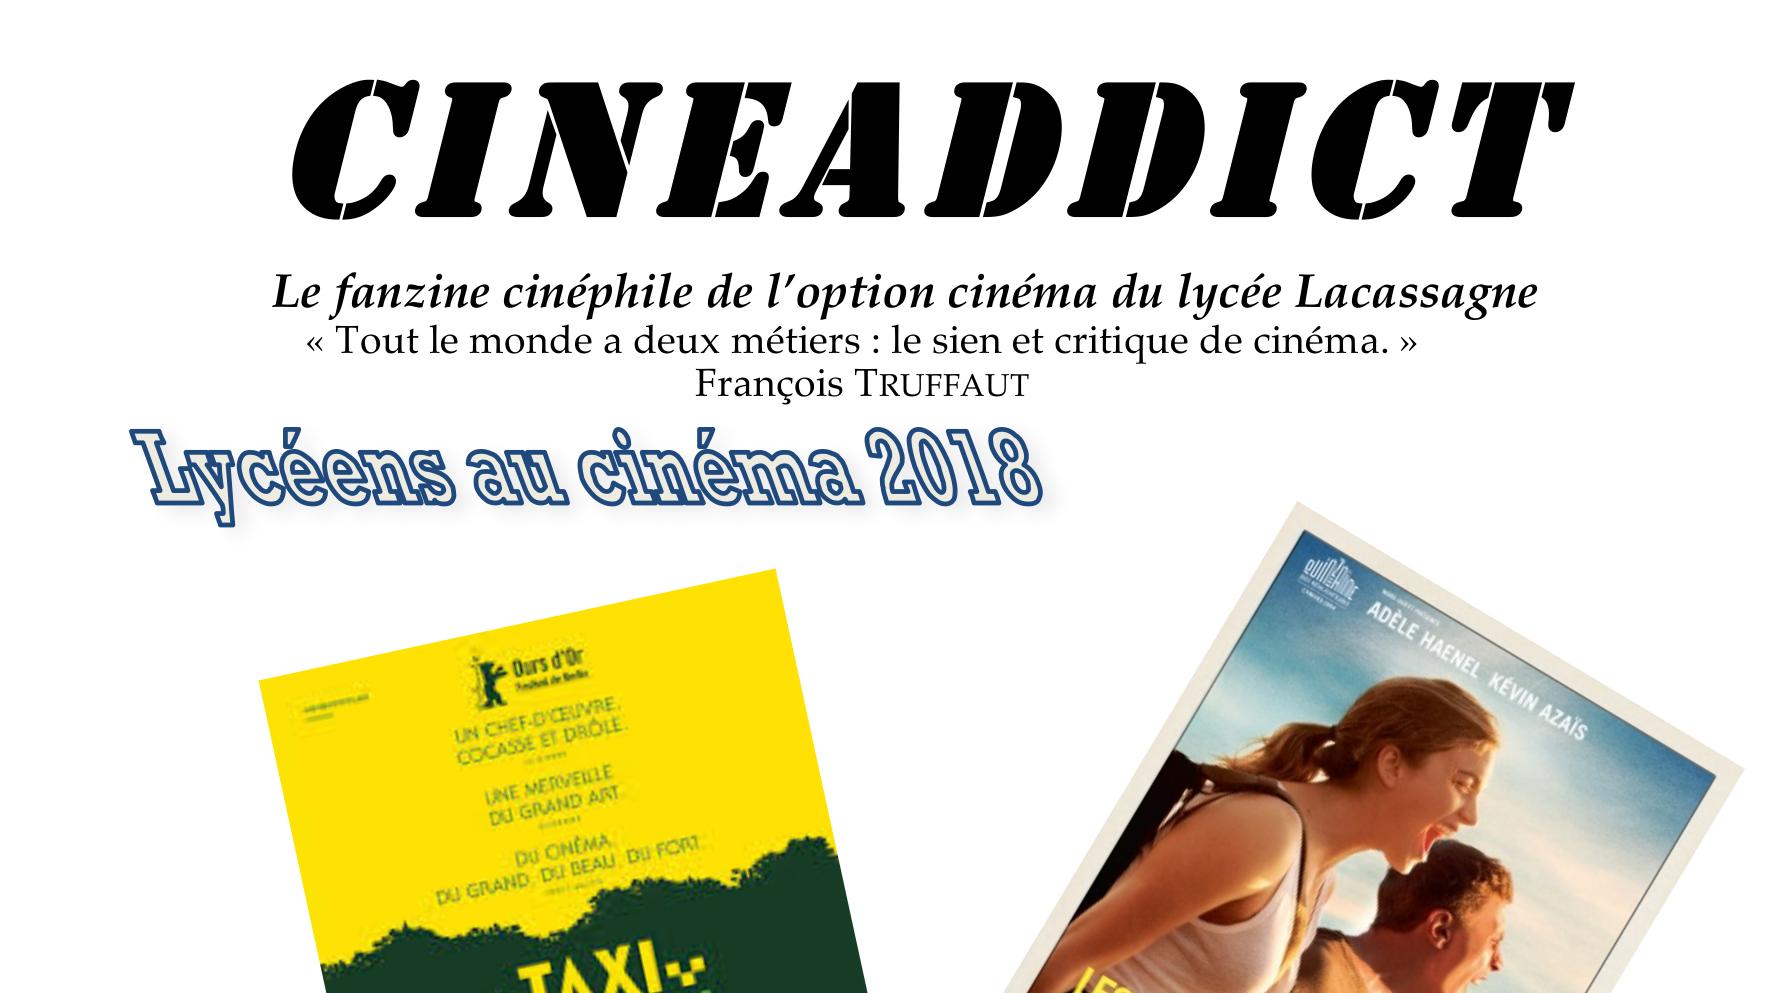 cineaddict9.png